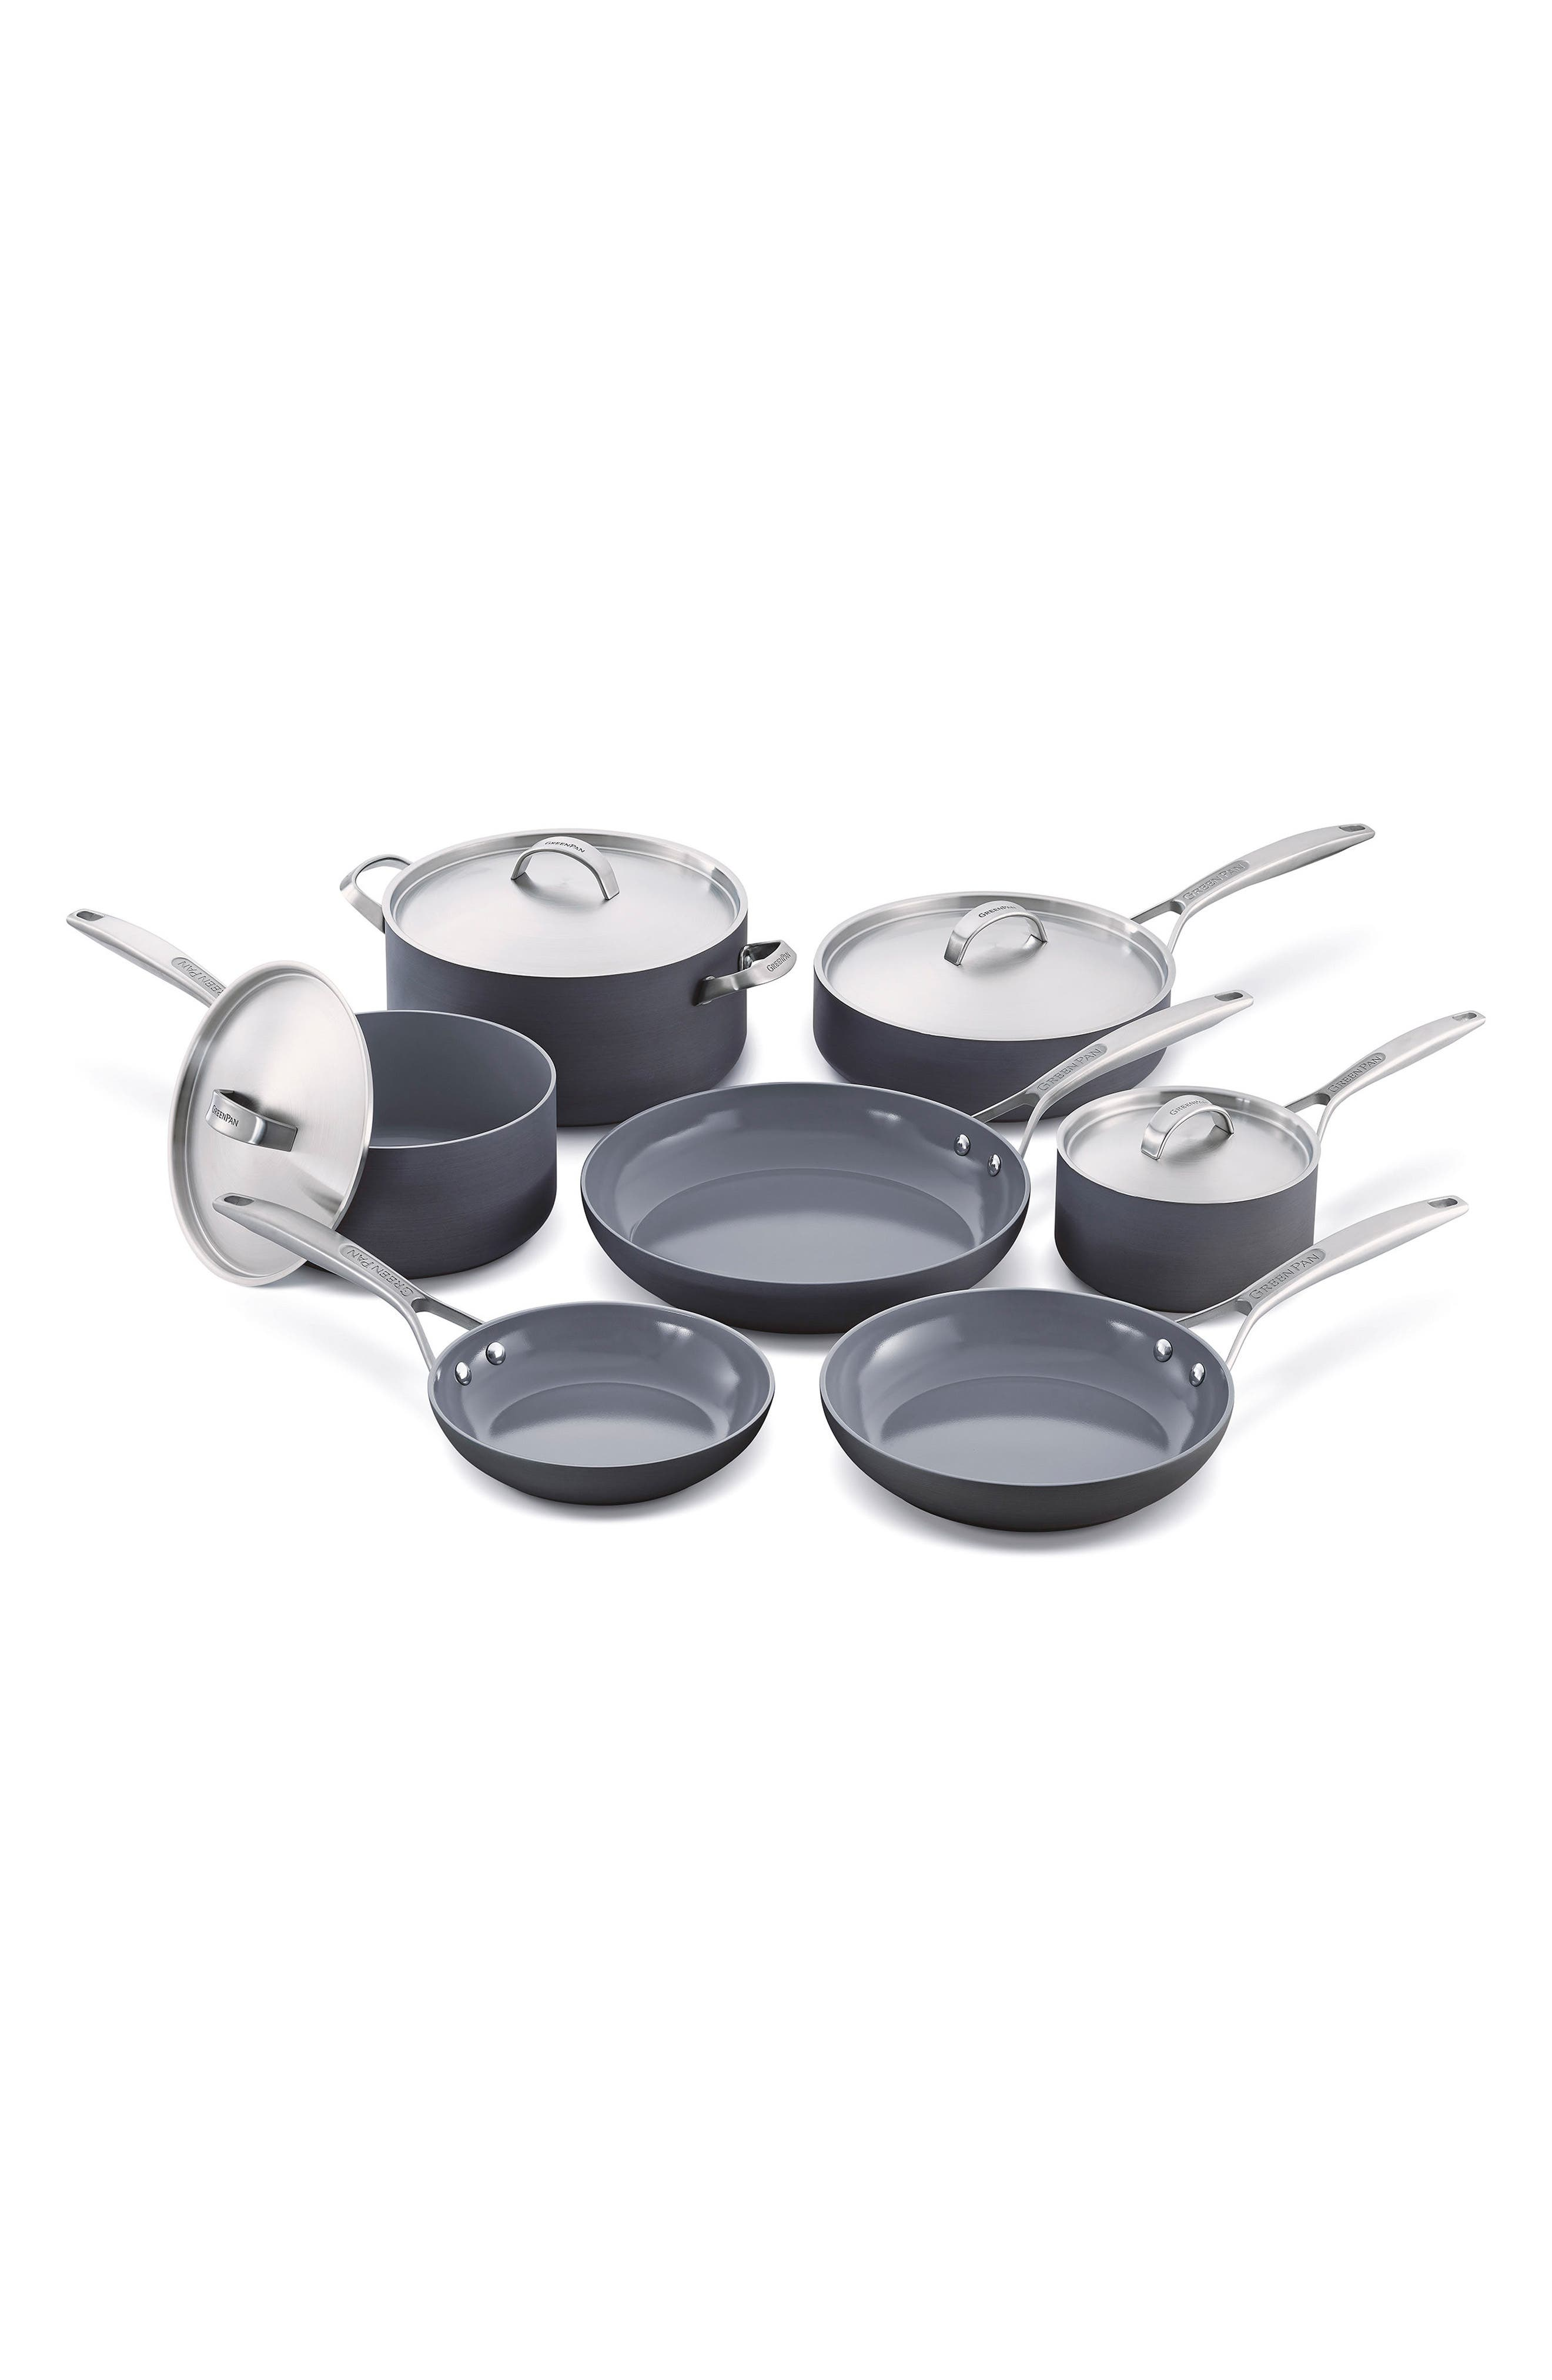 Paris Pro 11-Piece Anodized Aluminum Ceramic Cookware Set, Main, color, GREY